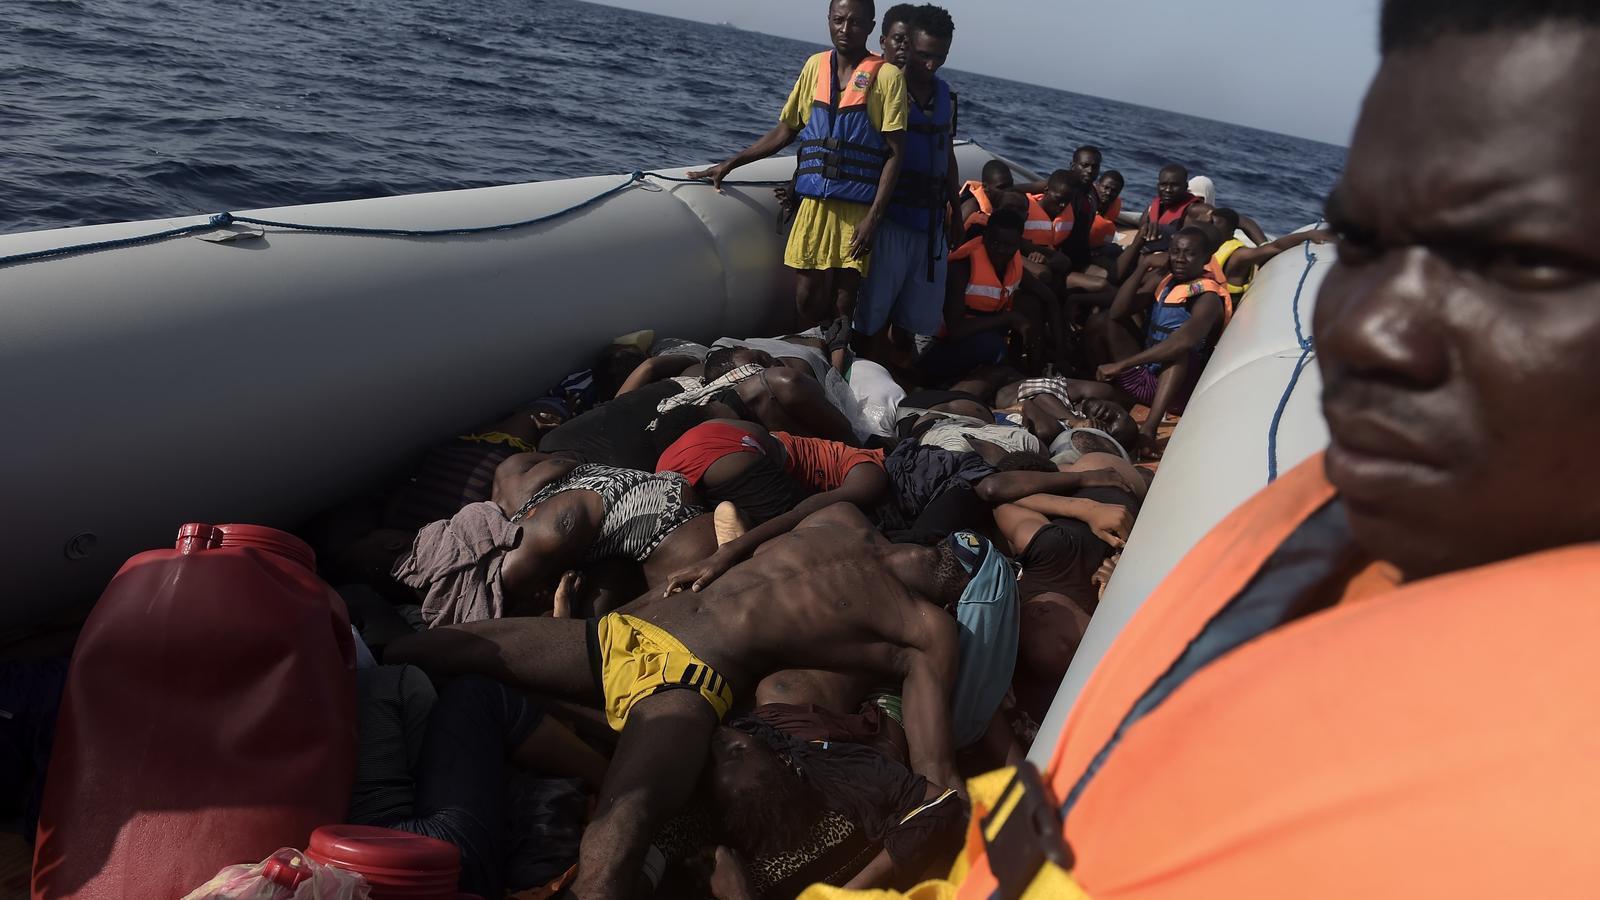 REFUGIADOS-UE II - Página 2 Minim-vintena-morts-avui-Mediterrani_1663043860_34457154_651x433